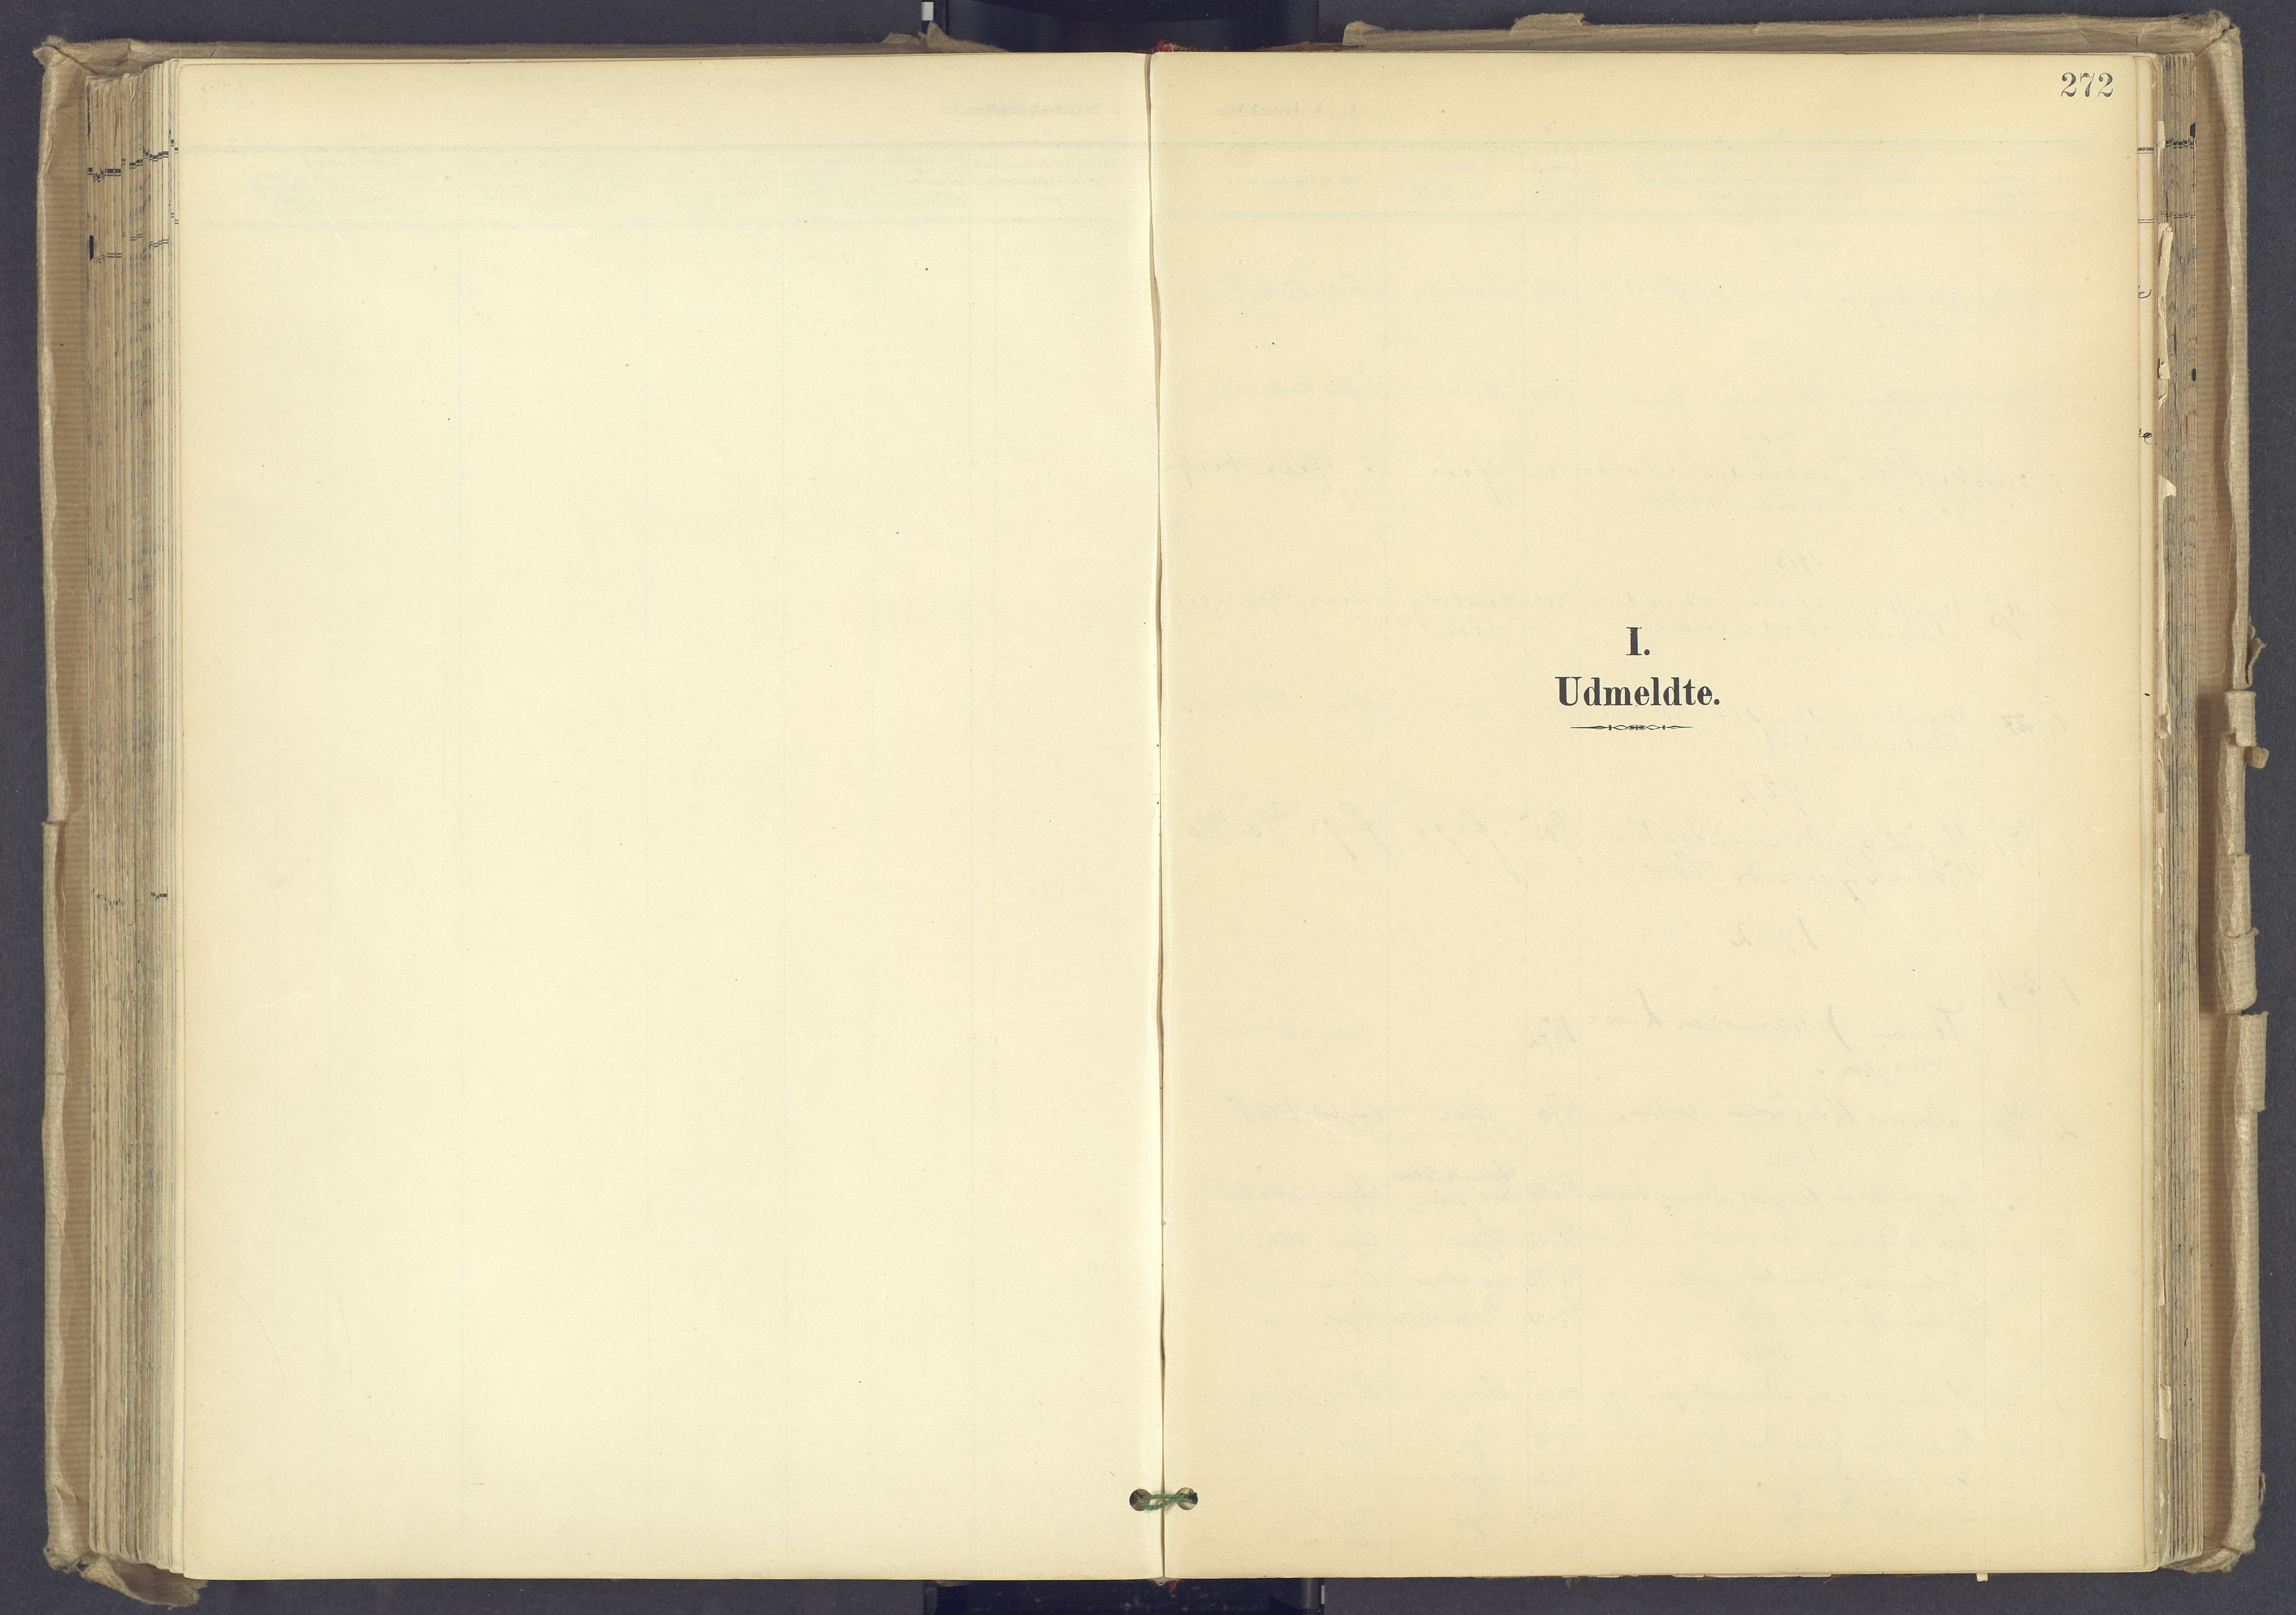 SAH, Øyer prestekontor, Ministerialbok nr. 12, 1897-1920, s. 272